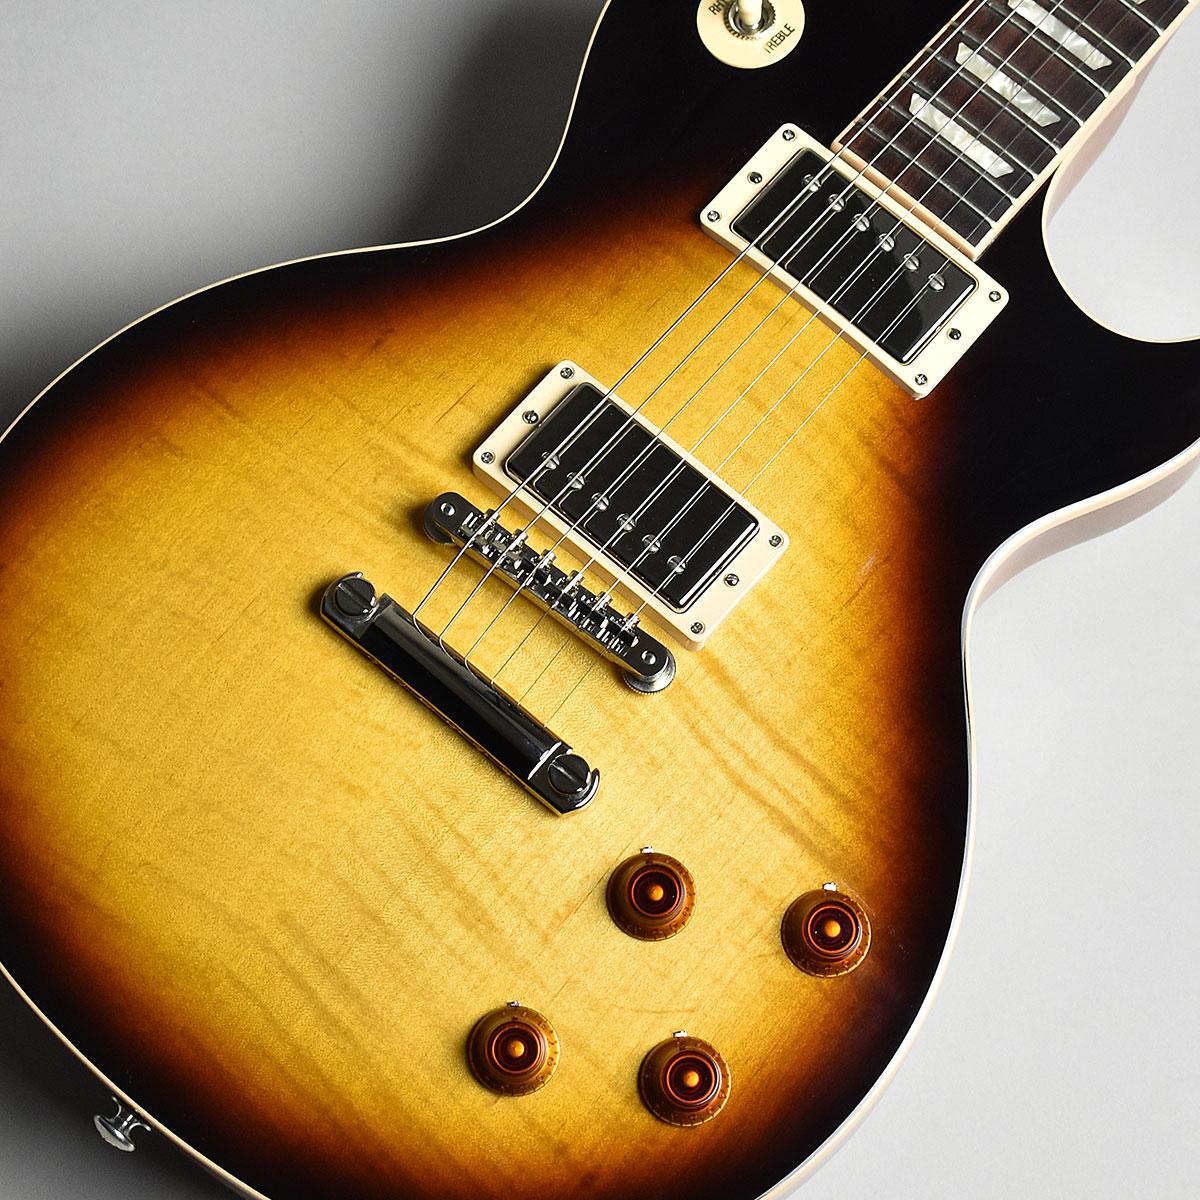 Gibson Les Paul Traditional 2019 Tobacco Burst S/N:190000378 【ギブソン レスポールトラディショナル】【未展示品】